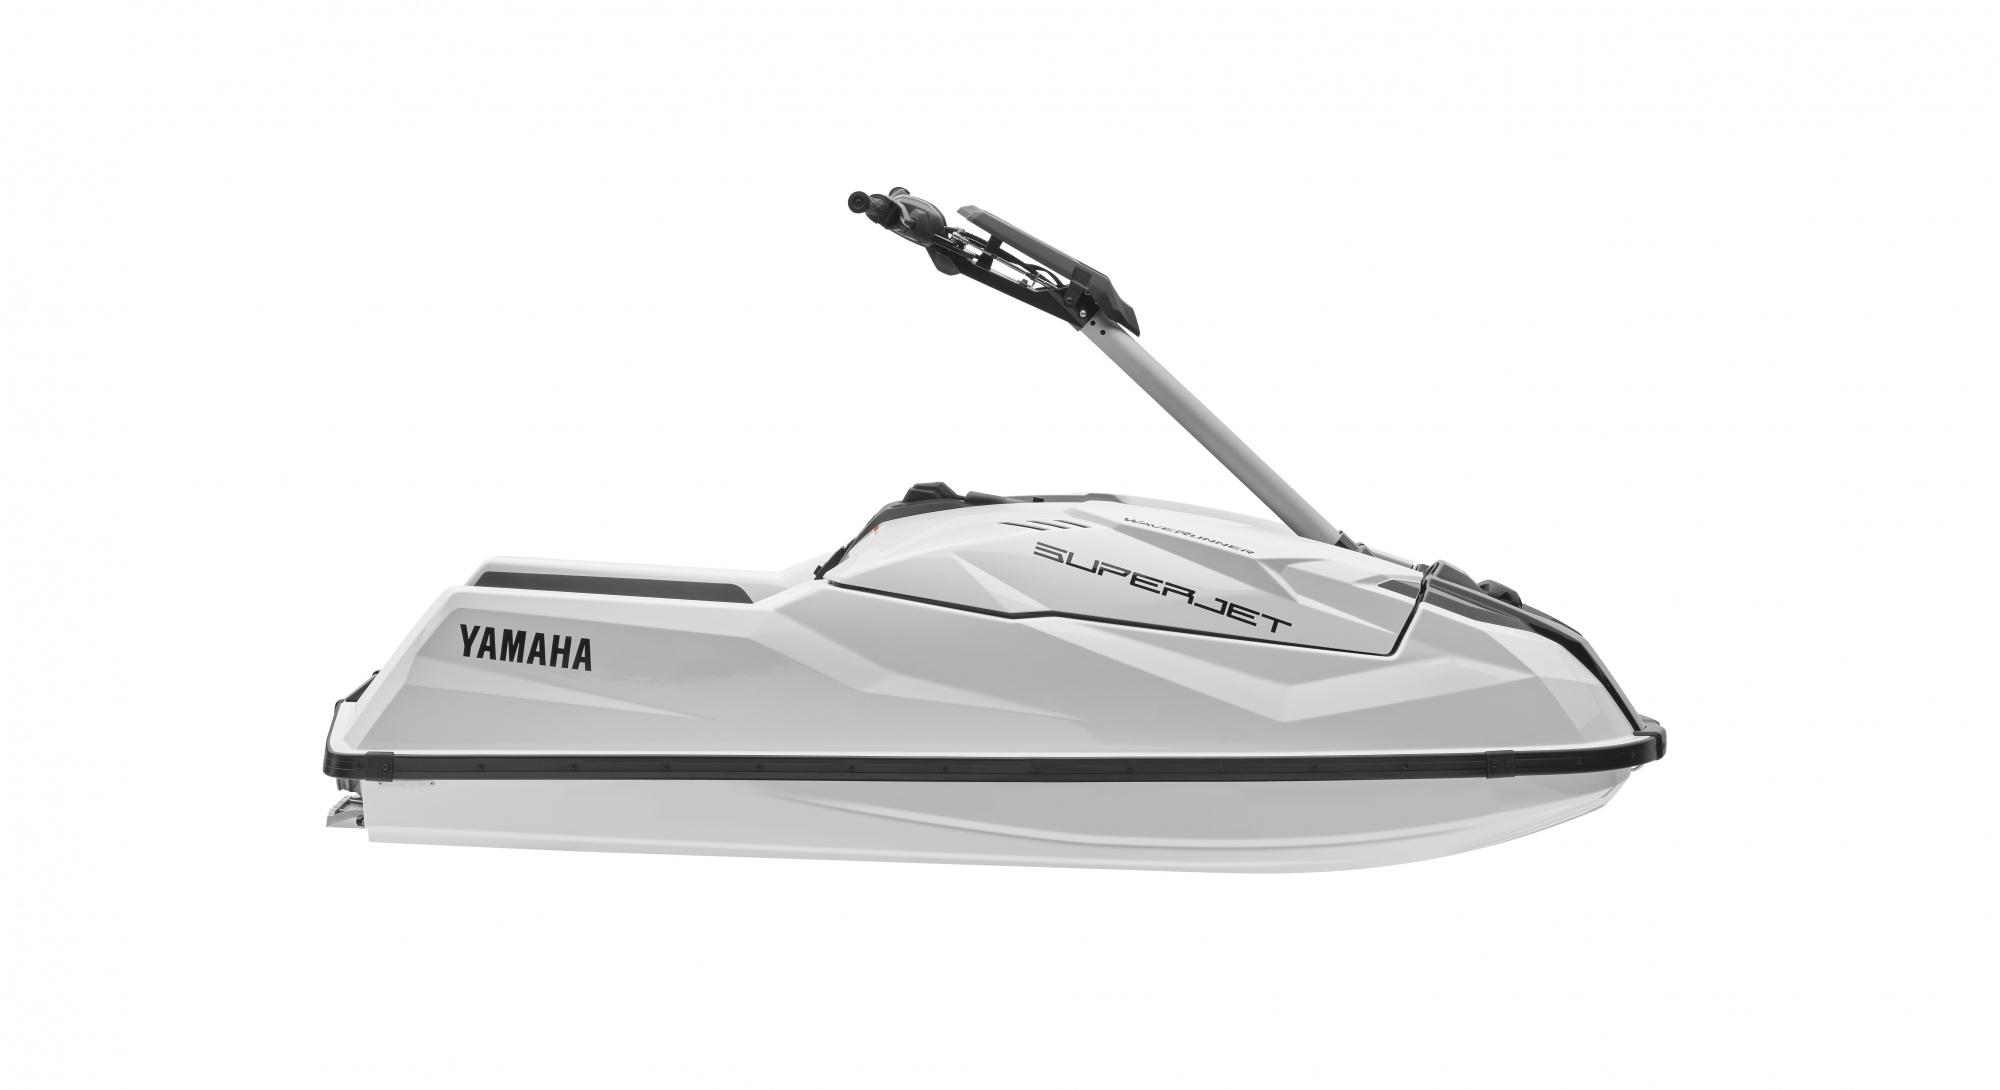 Yamaha superjet - 2021_Superjet_White_1-2